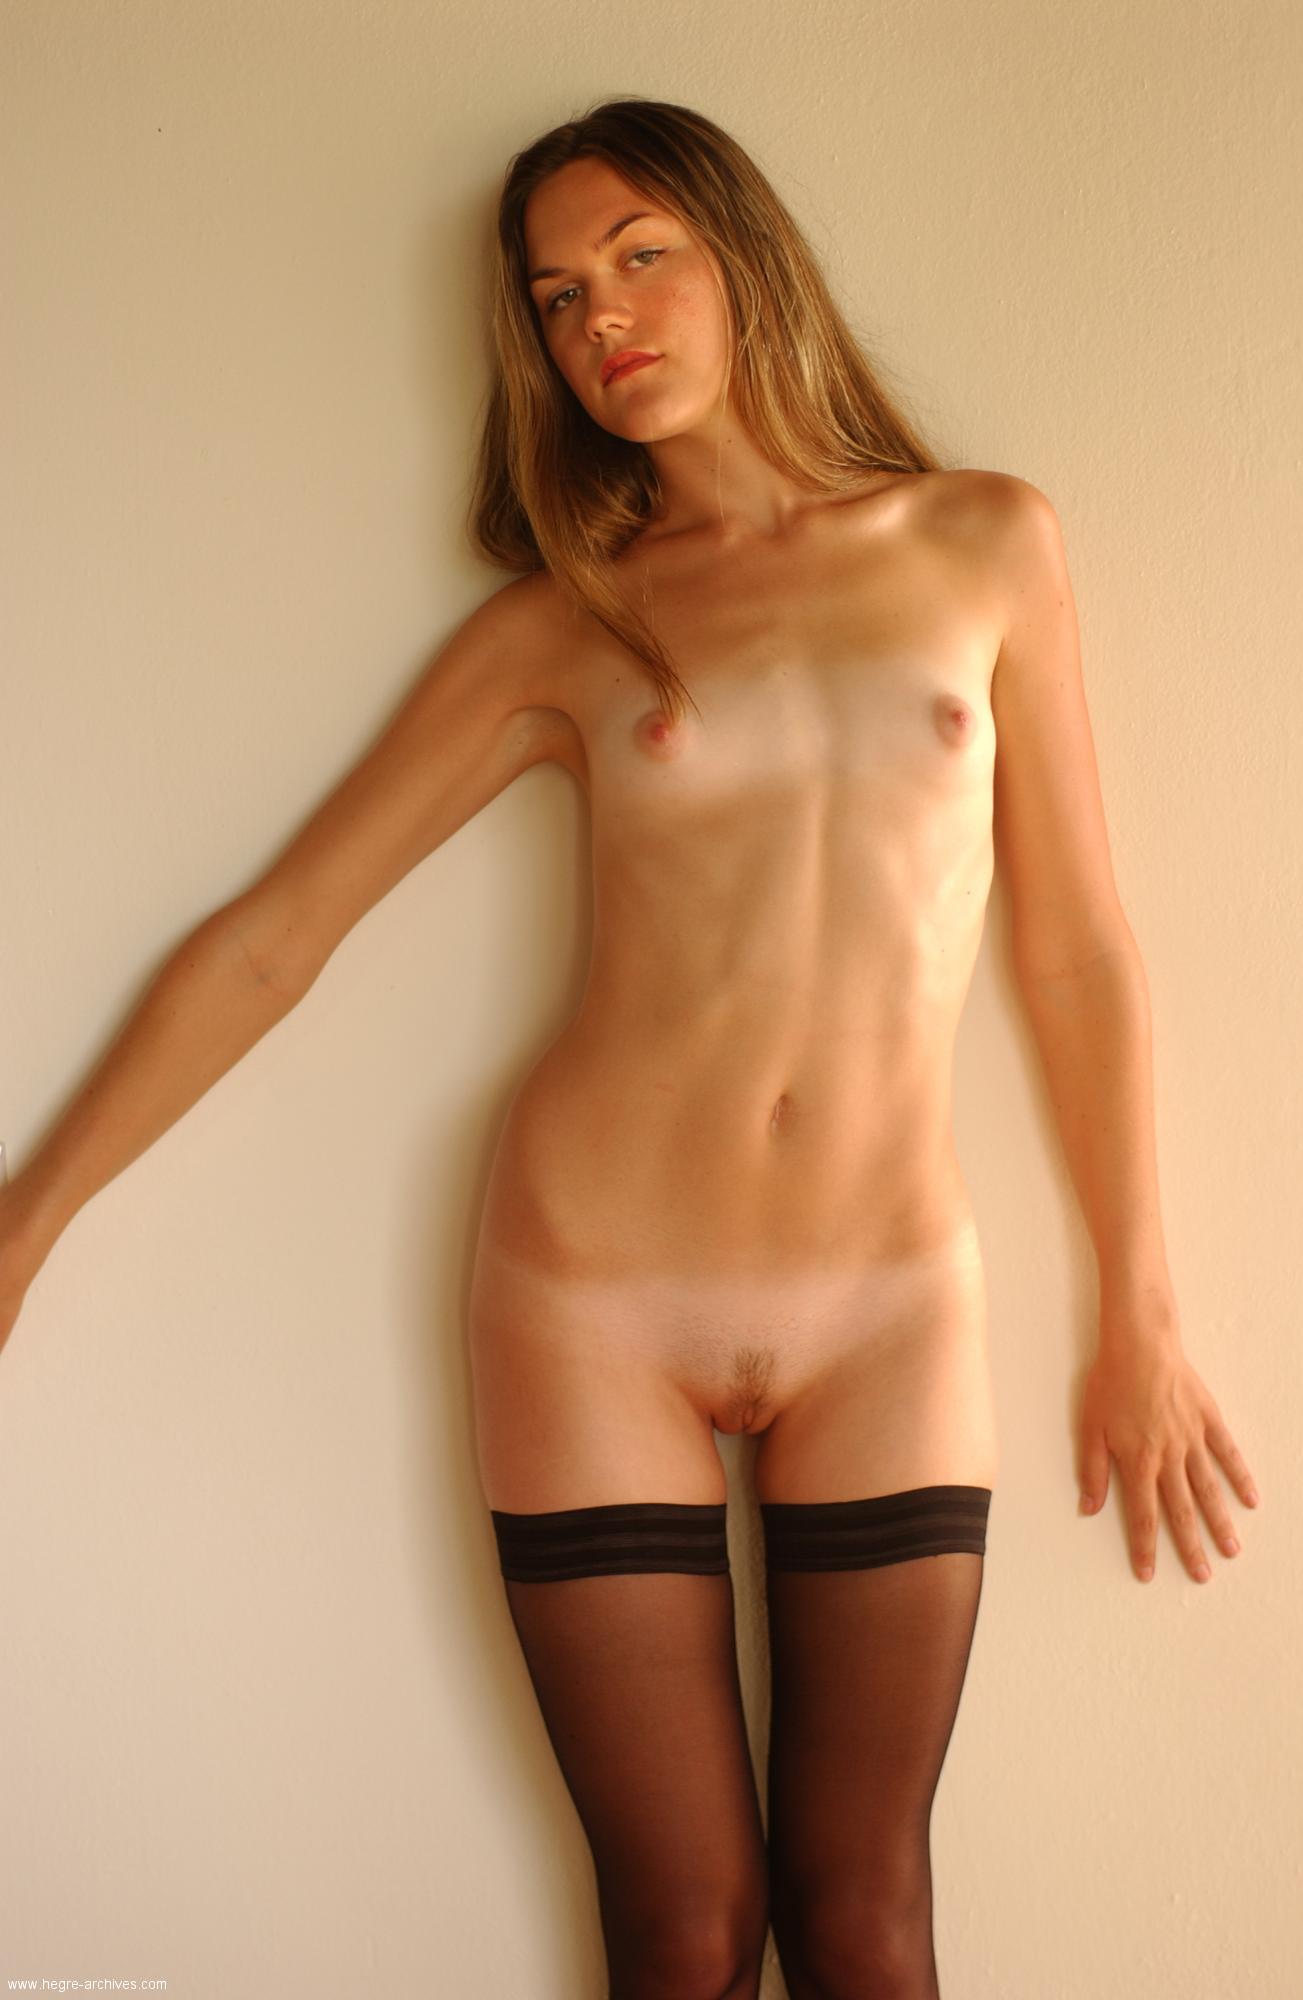 Nude tiny models princess congratulate, seems